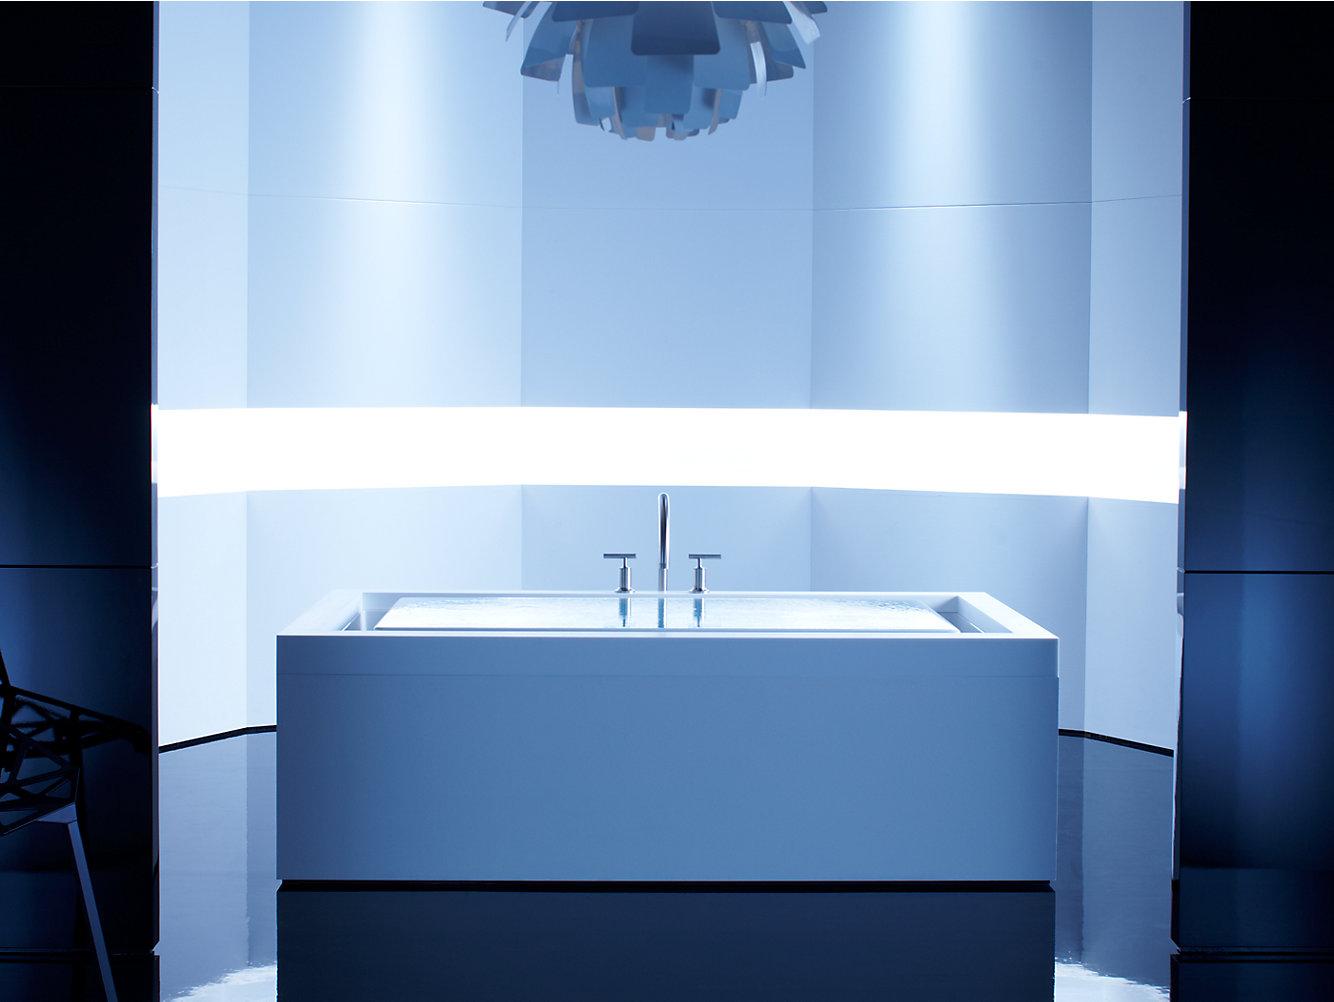 Famous Kolher Tubs Illustration - Bathtub Design Ideas - klotsnet.com